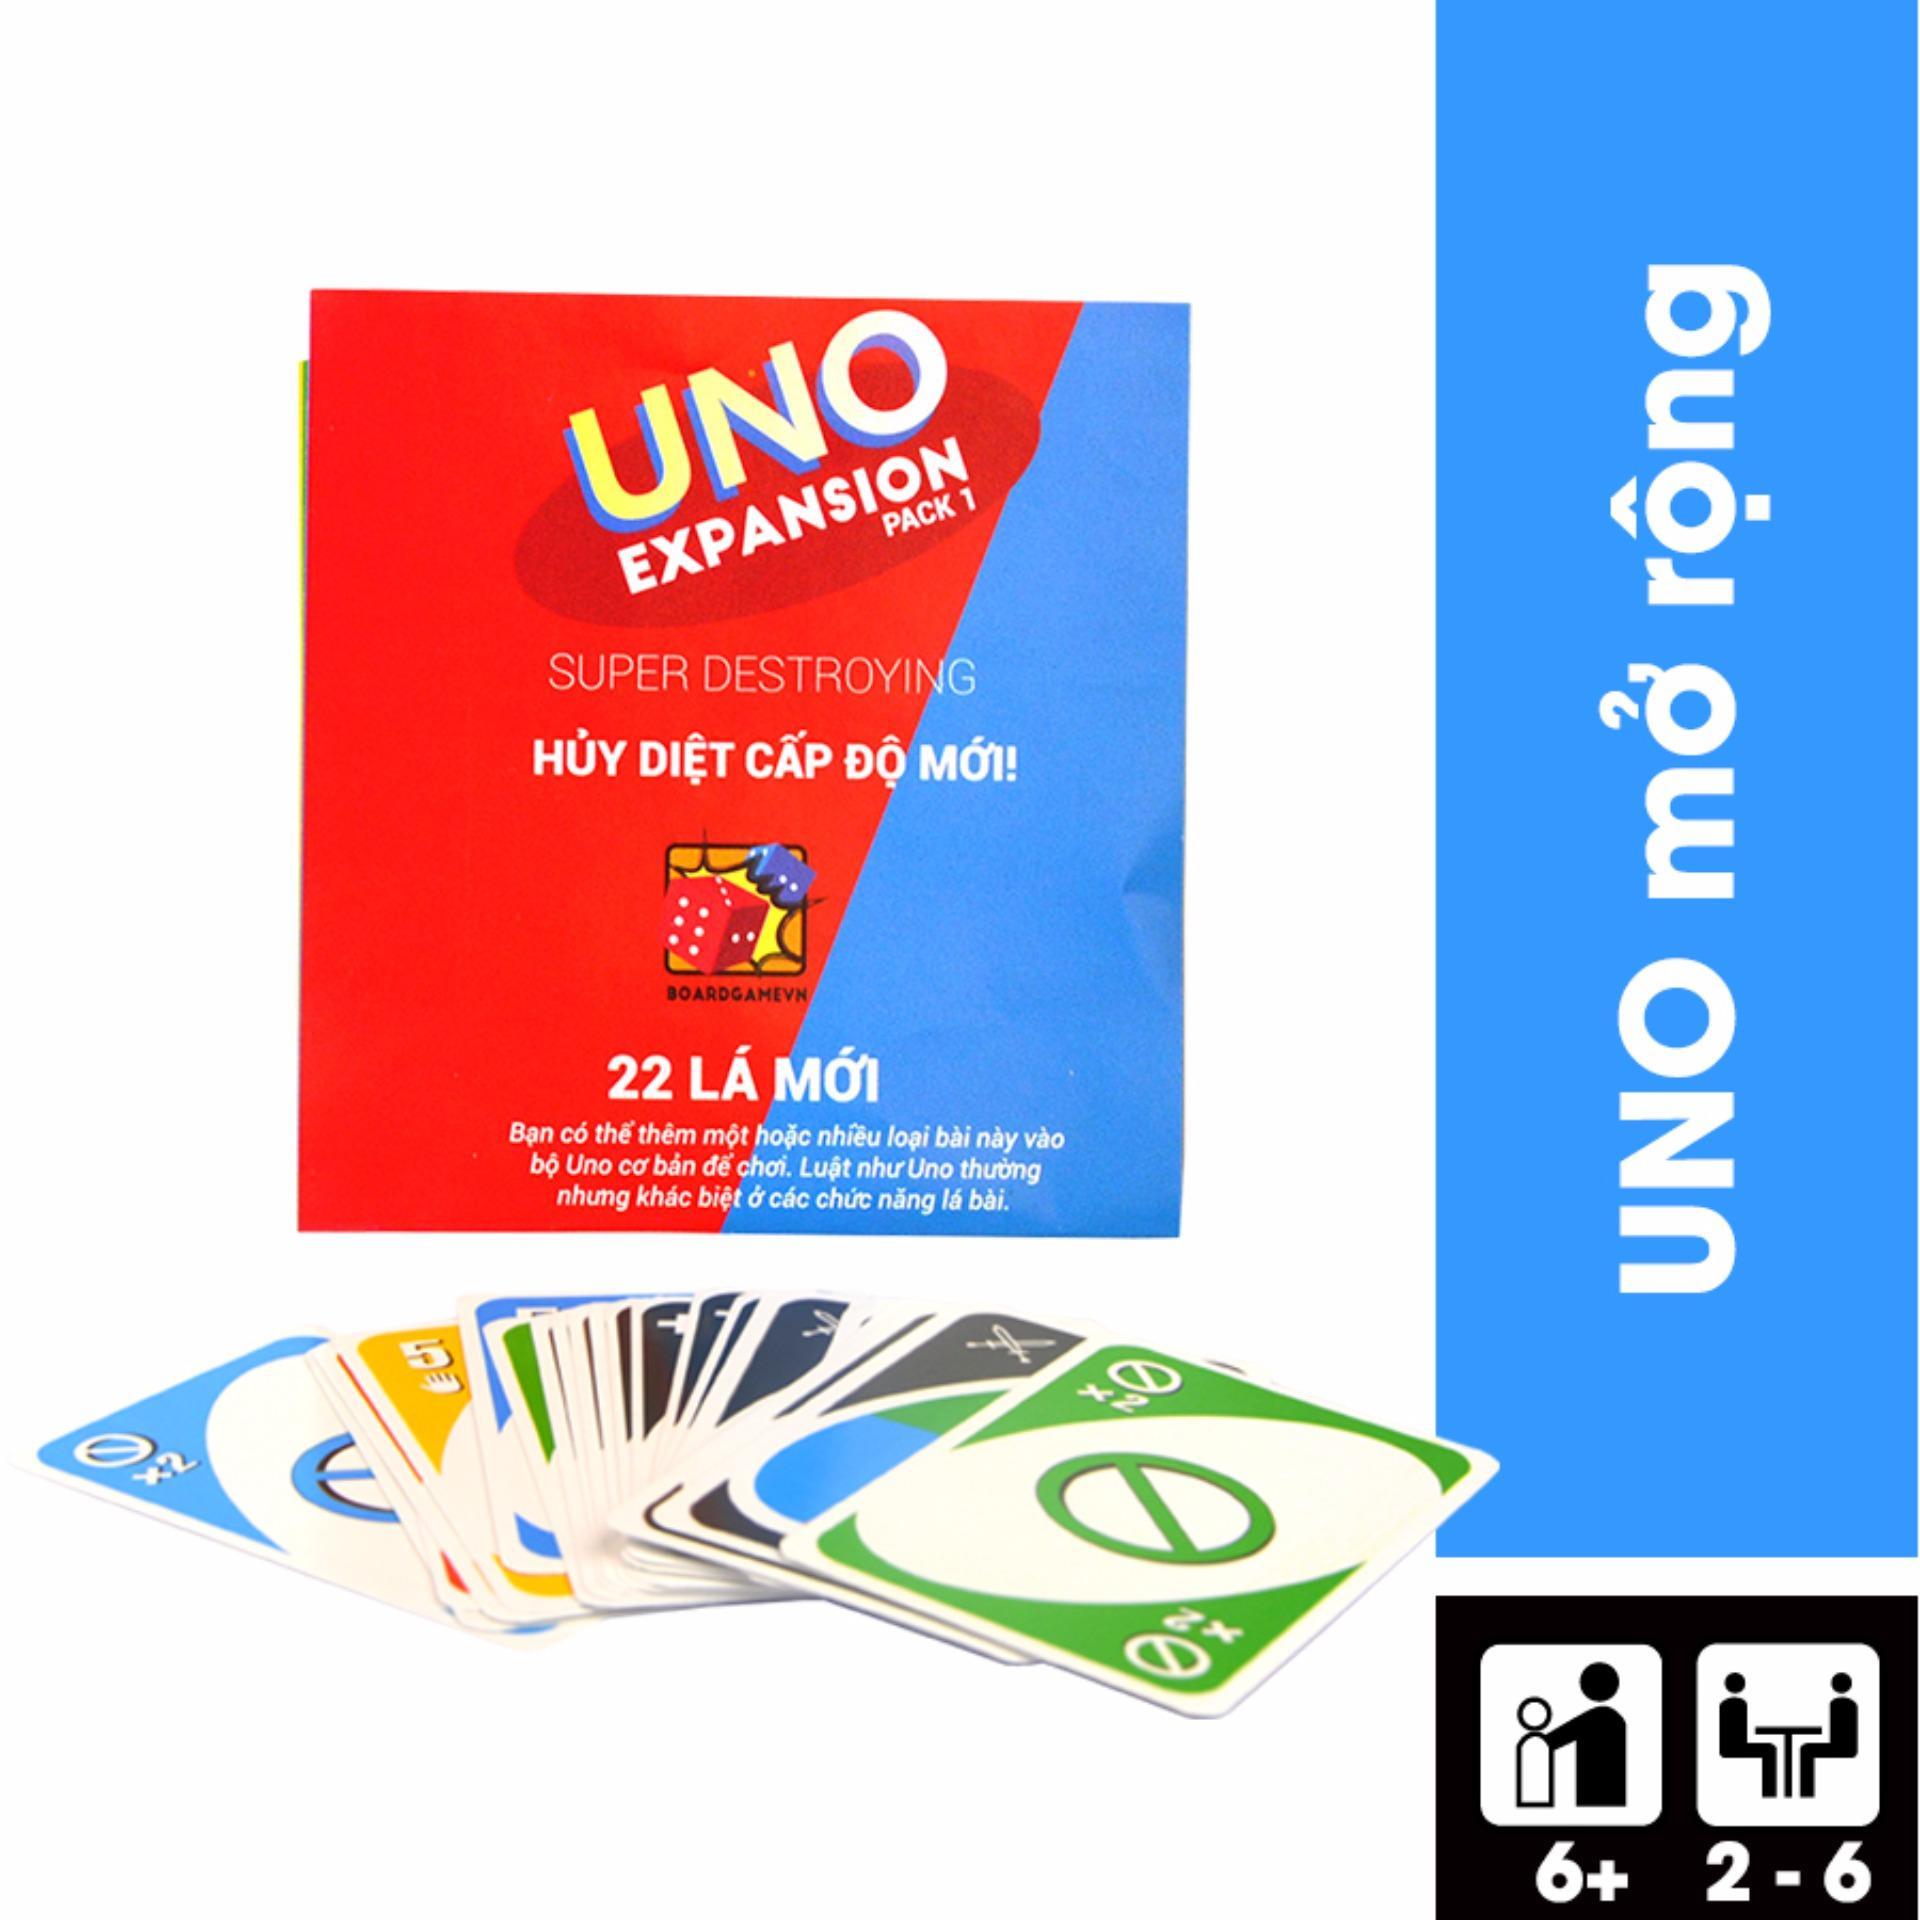 Uno battle – Bản mở rộng #1 của Uno